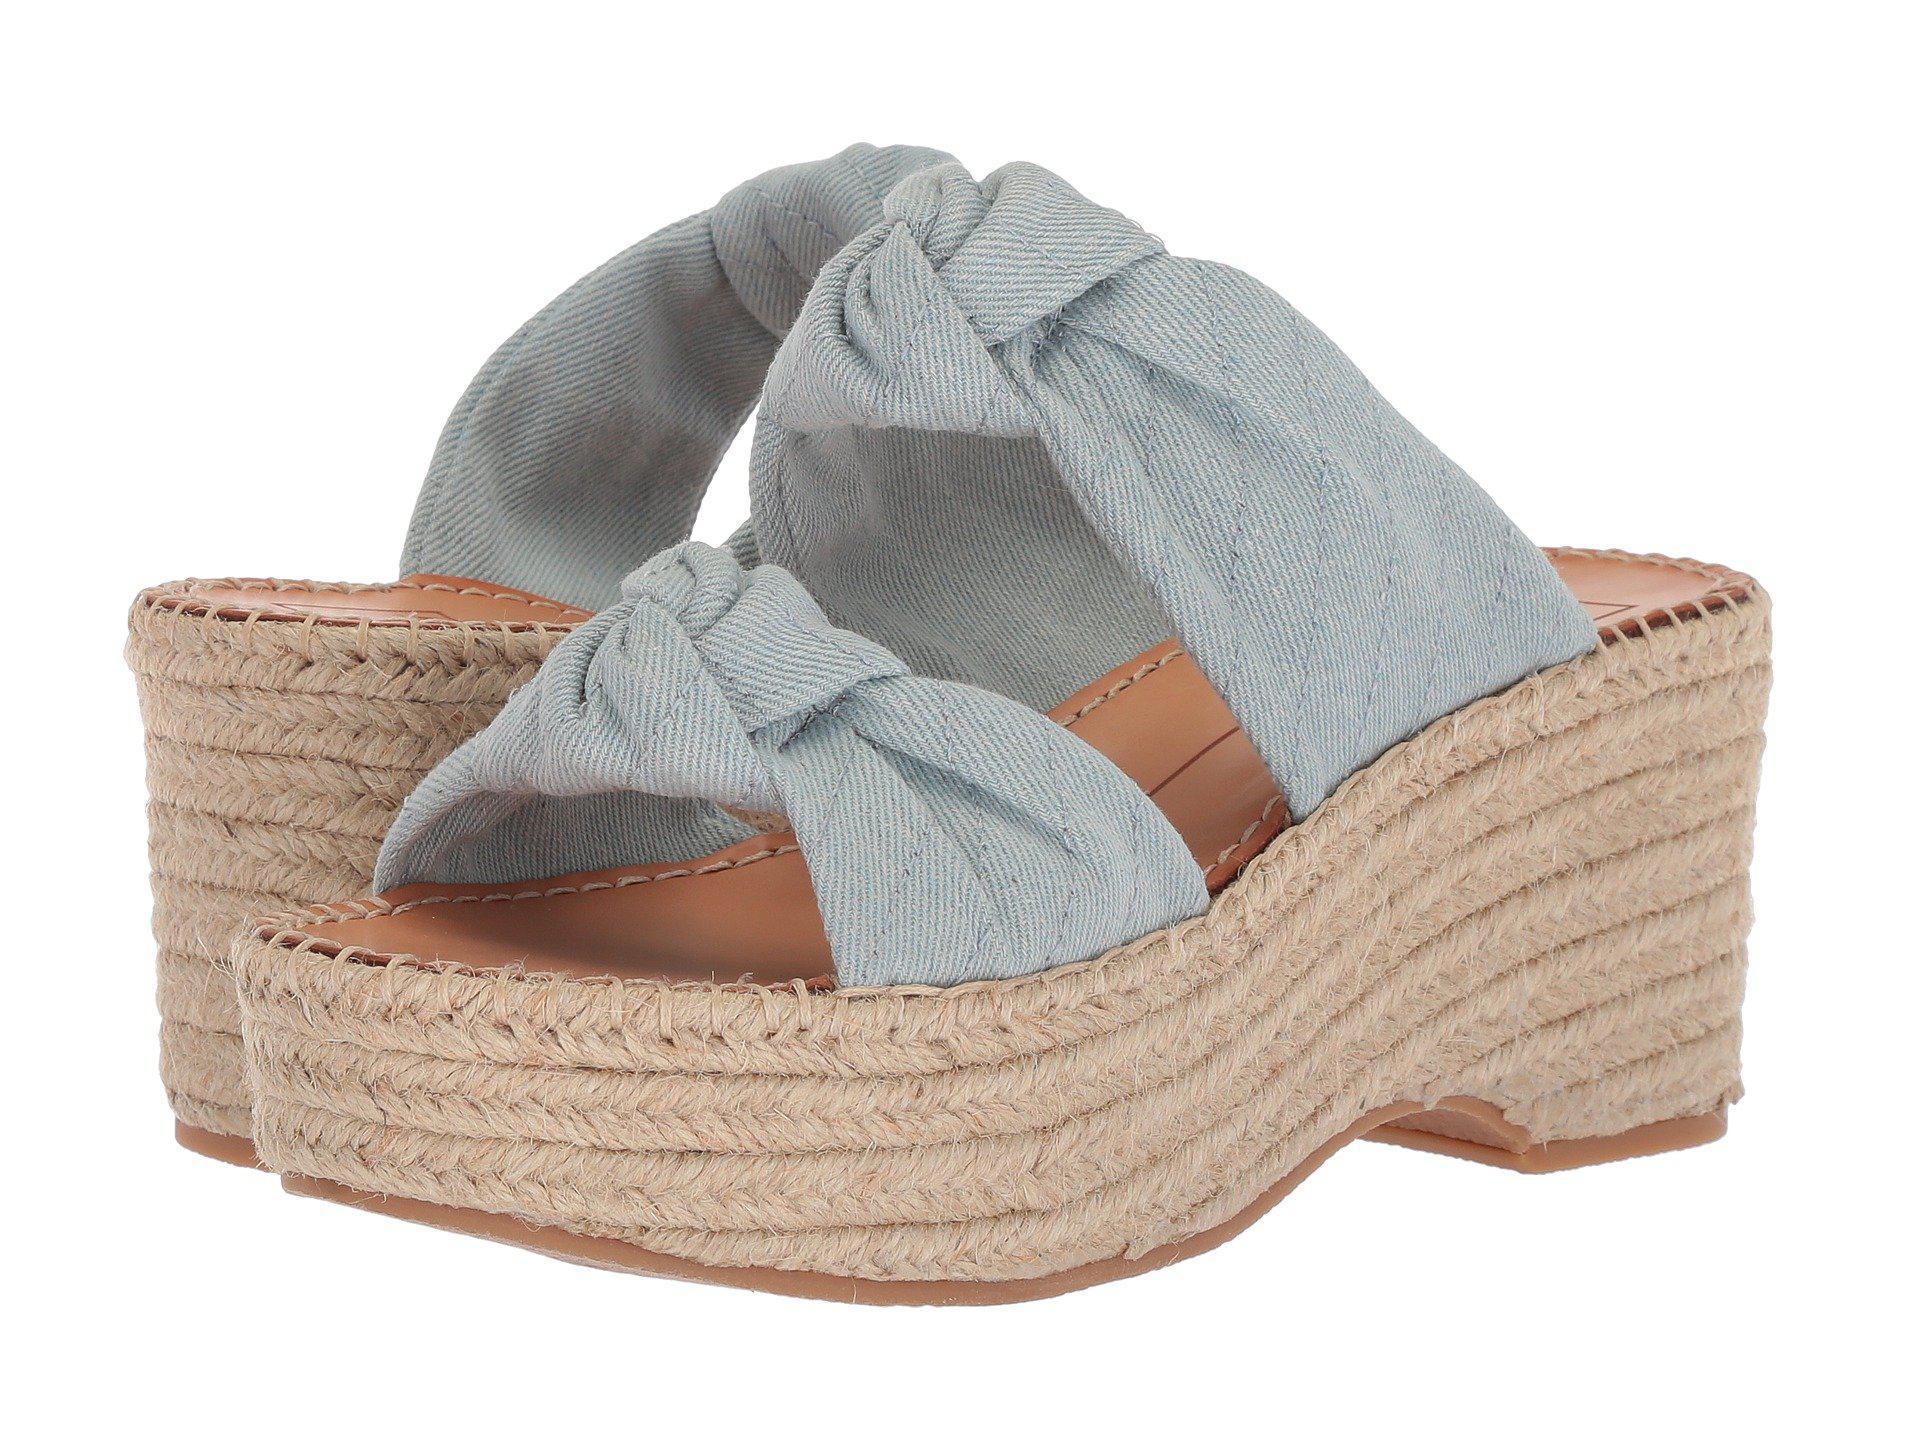 b0c13ab2c46 Lyst - Dolce Vita Lera Espadrille Wedge Sandal in Blue - Save 23%